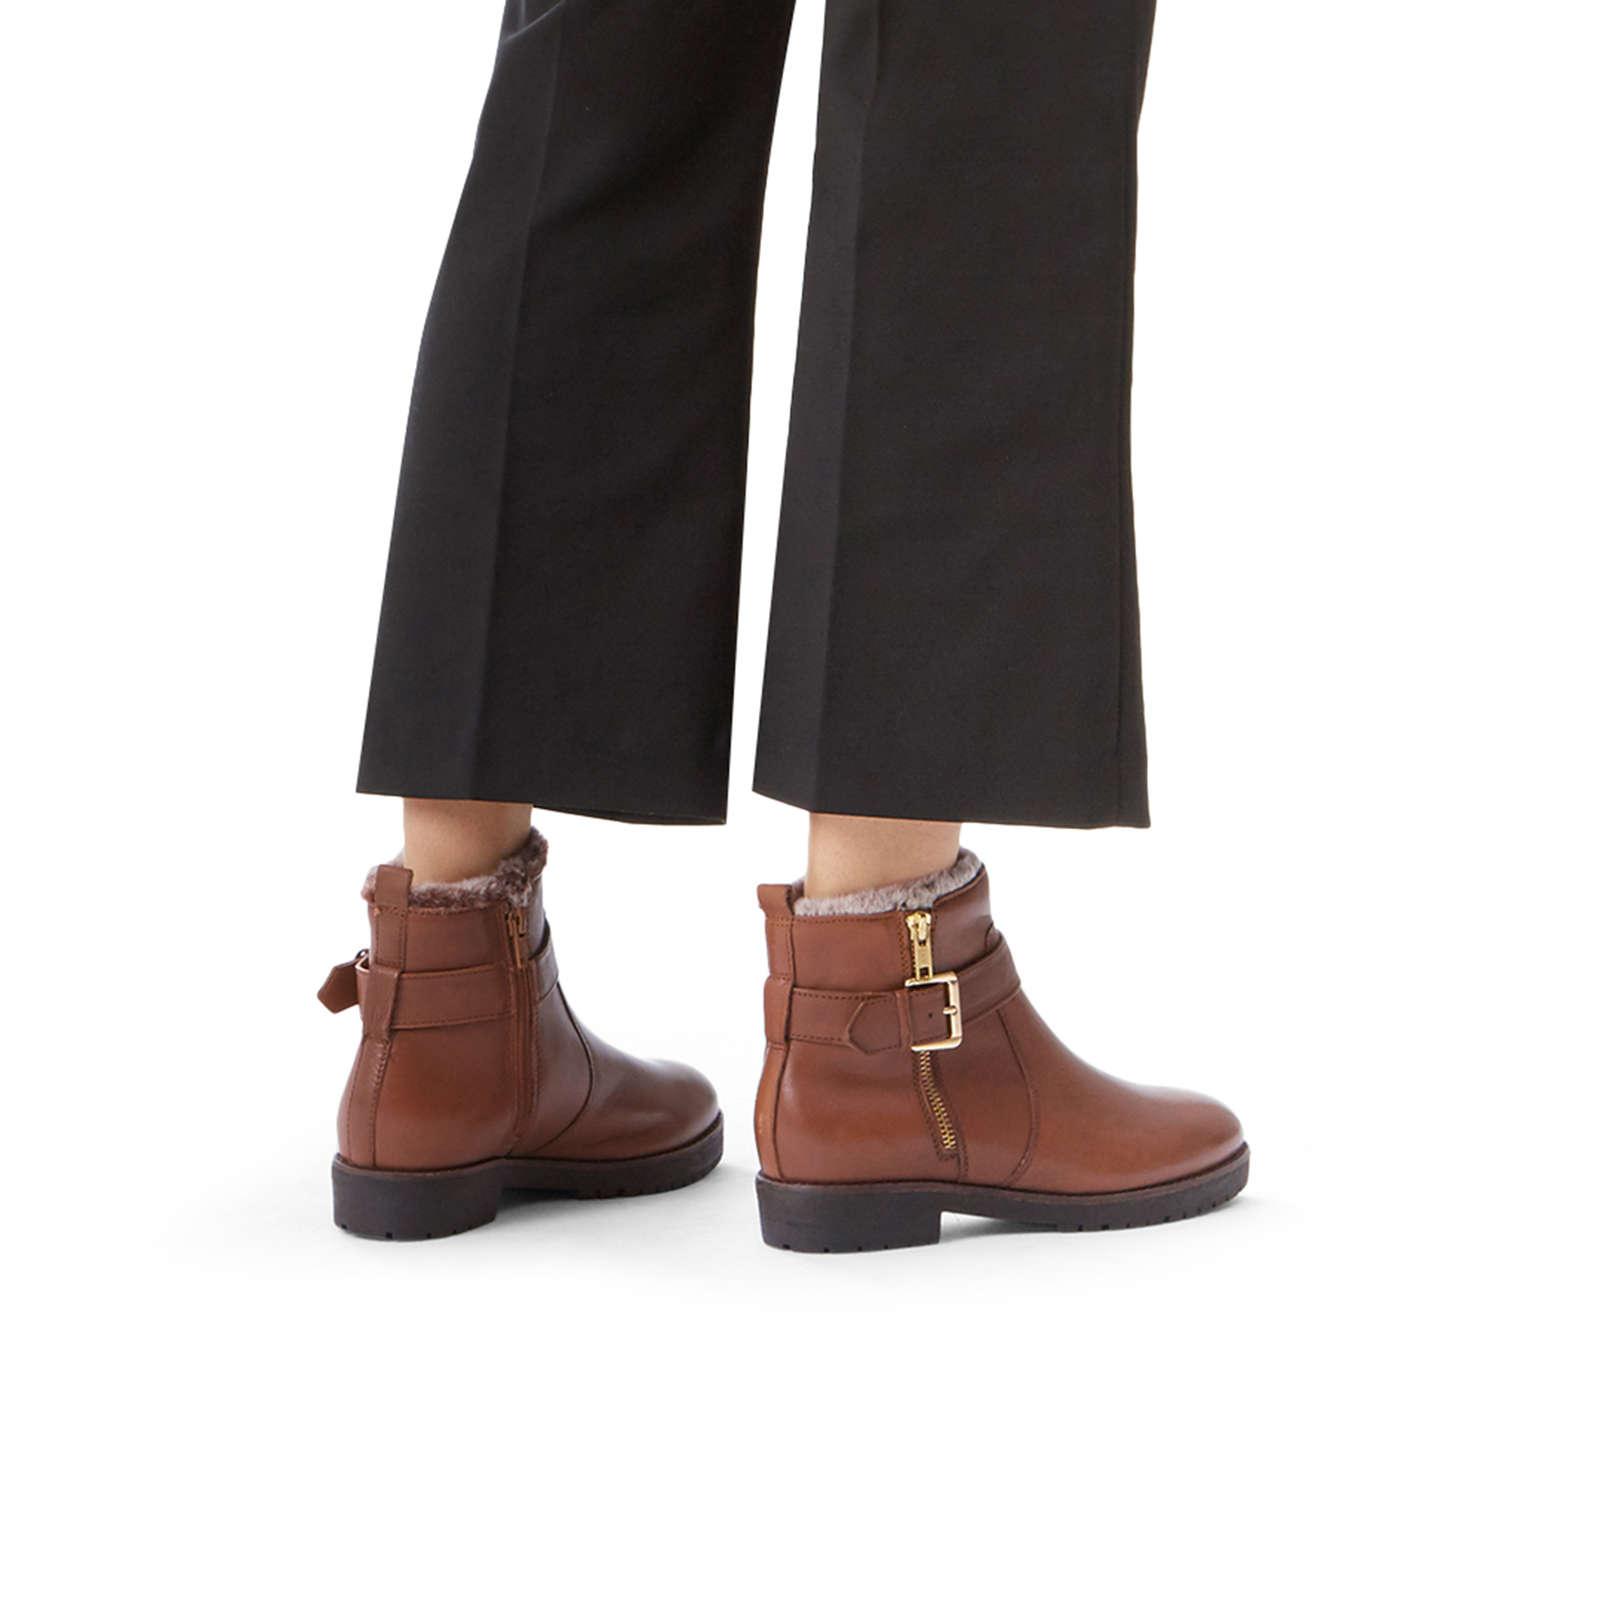 kurt geiger scout boots outlet store